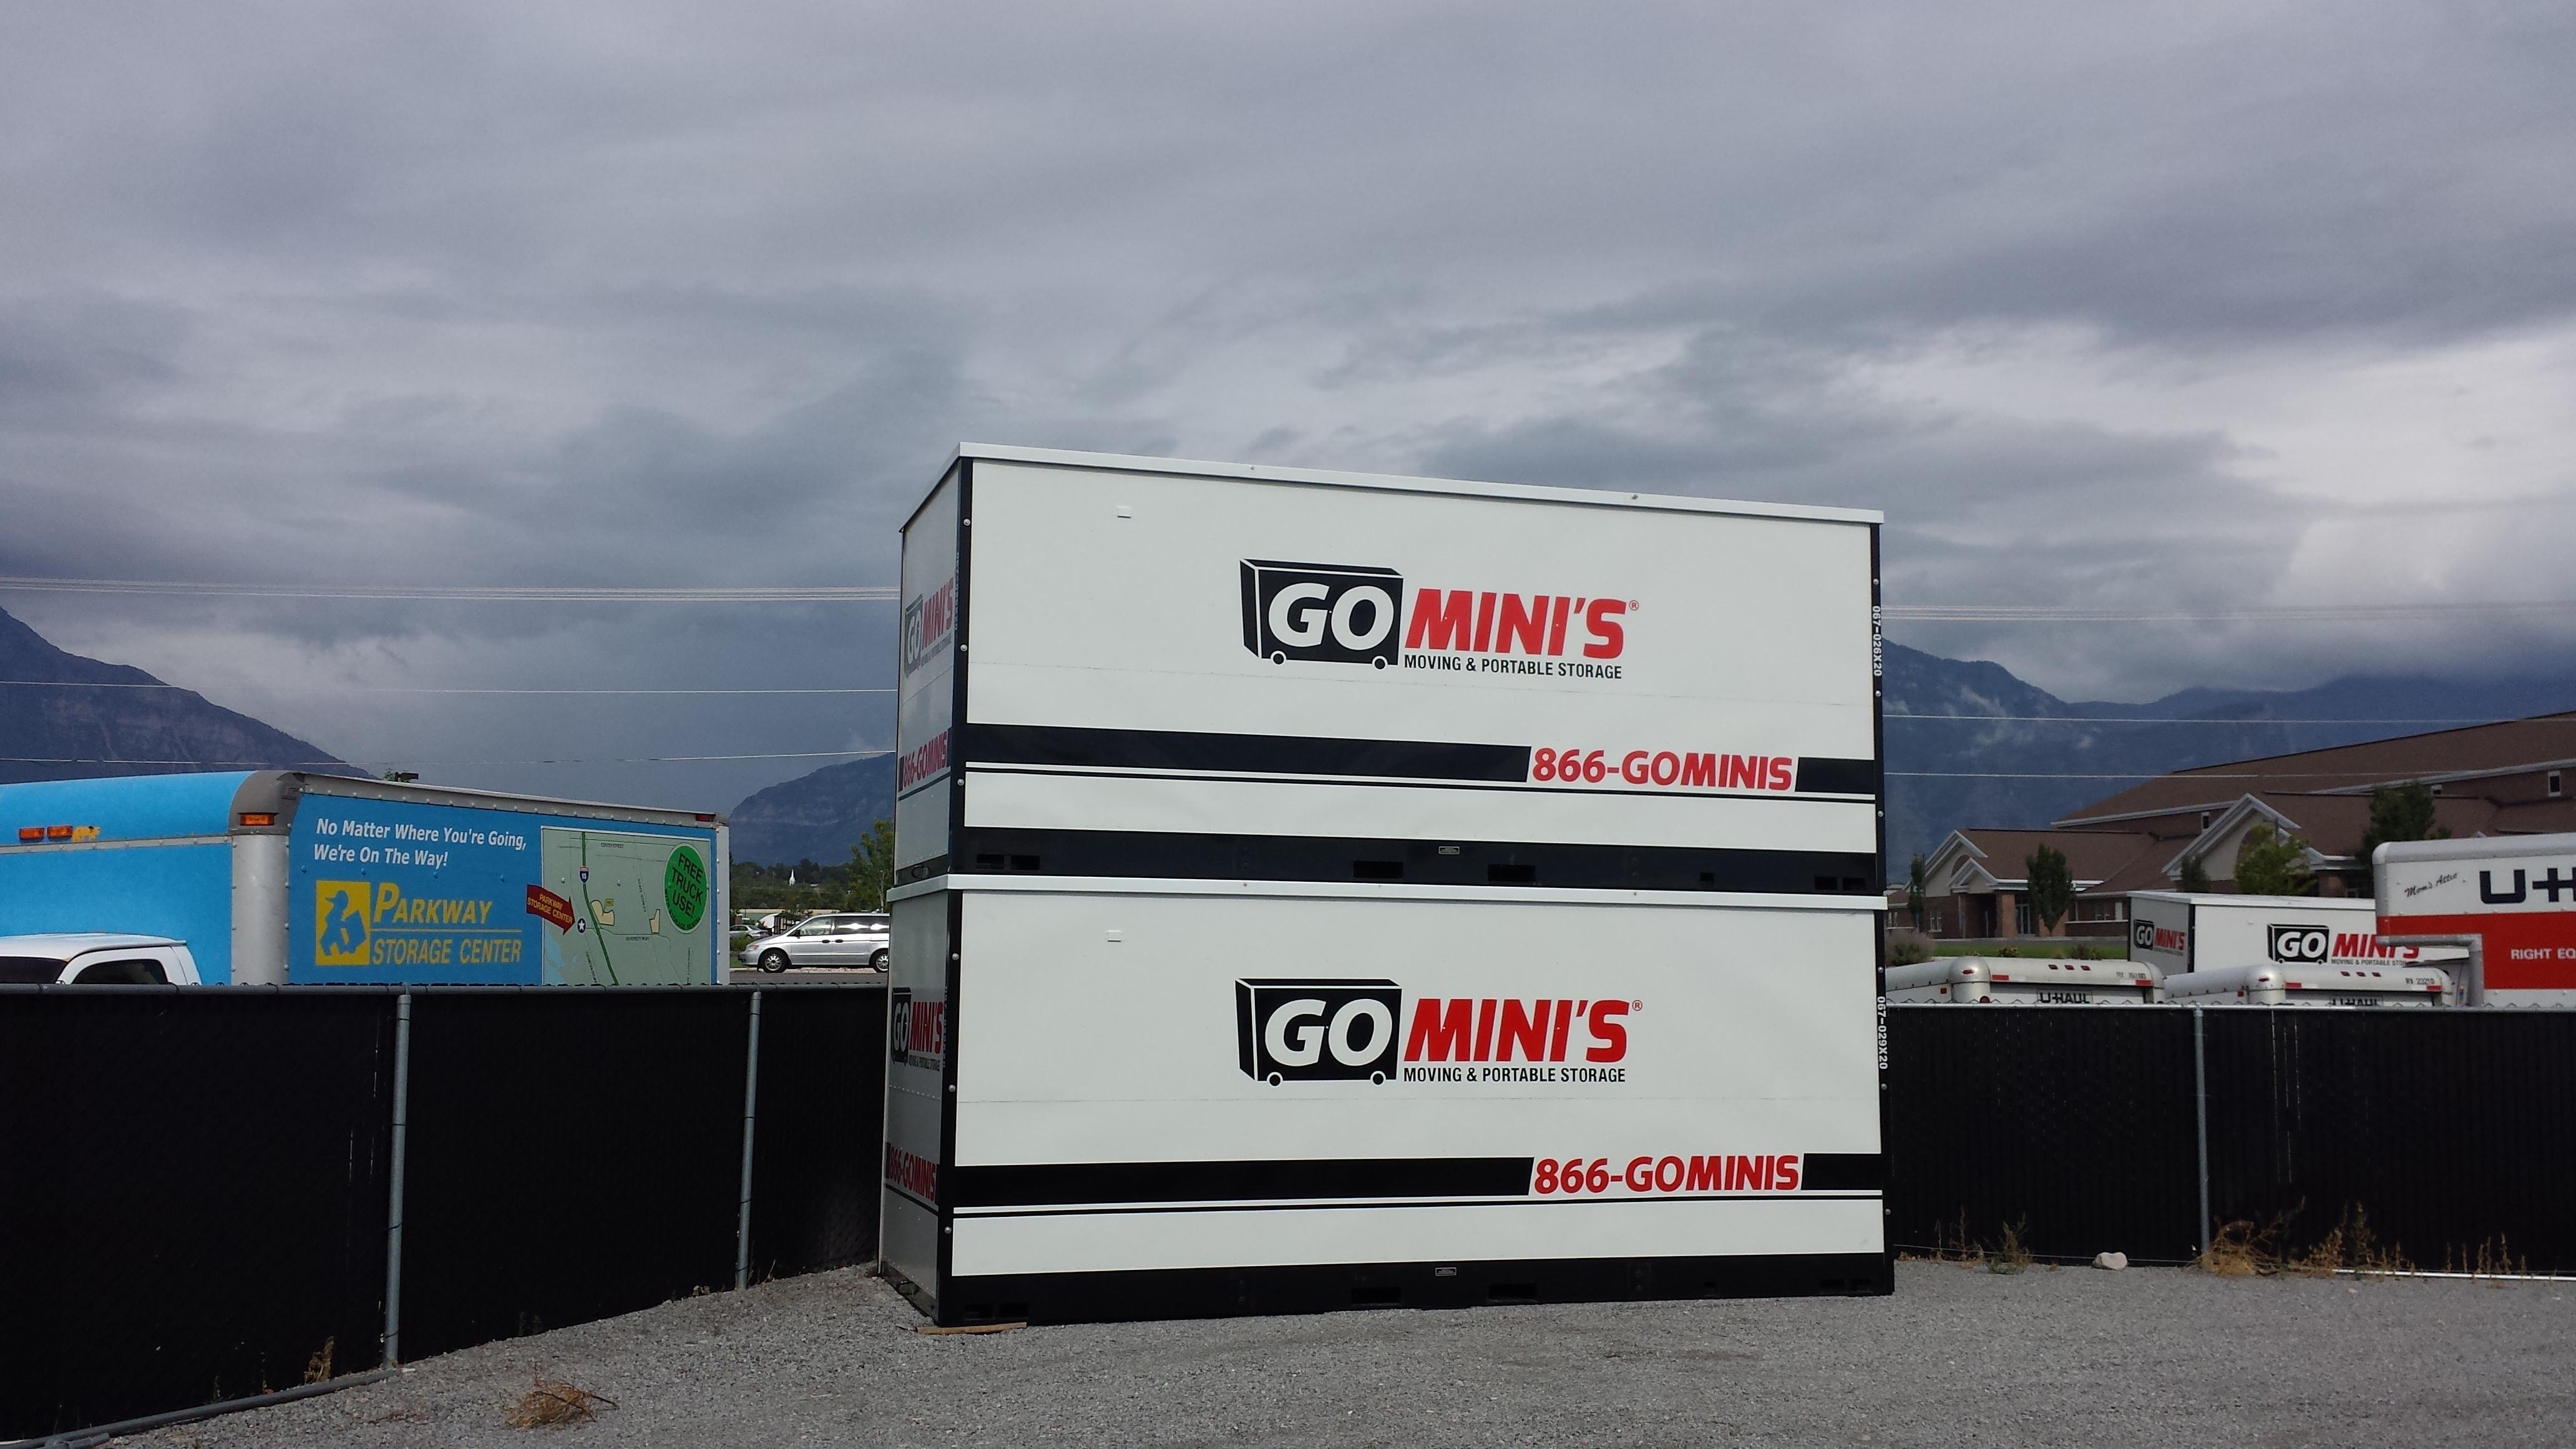 Go Mini's Moving & Portable Storage image 27